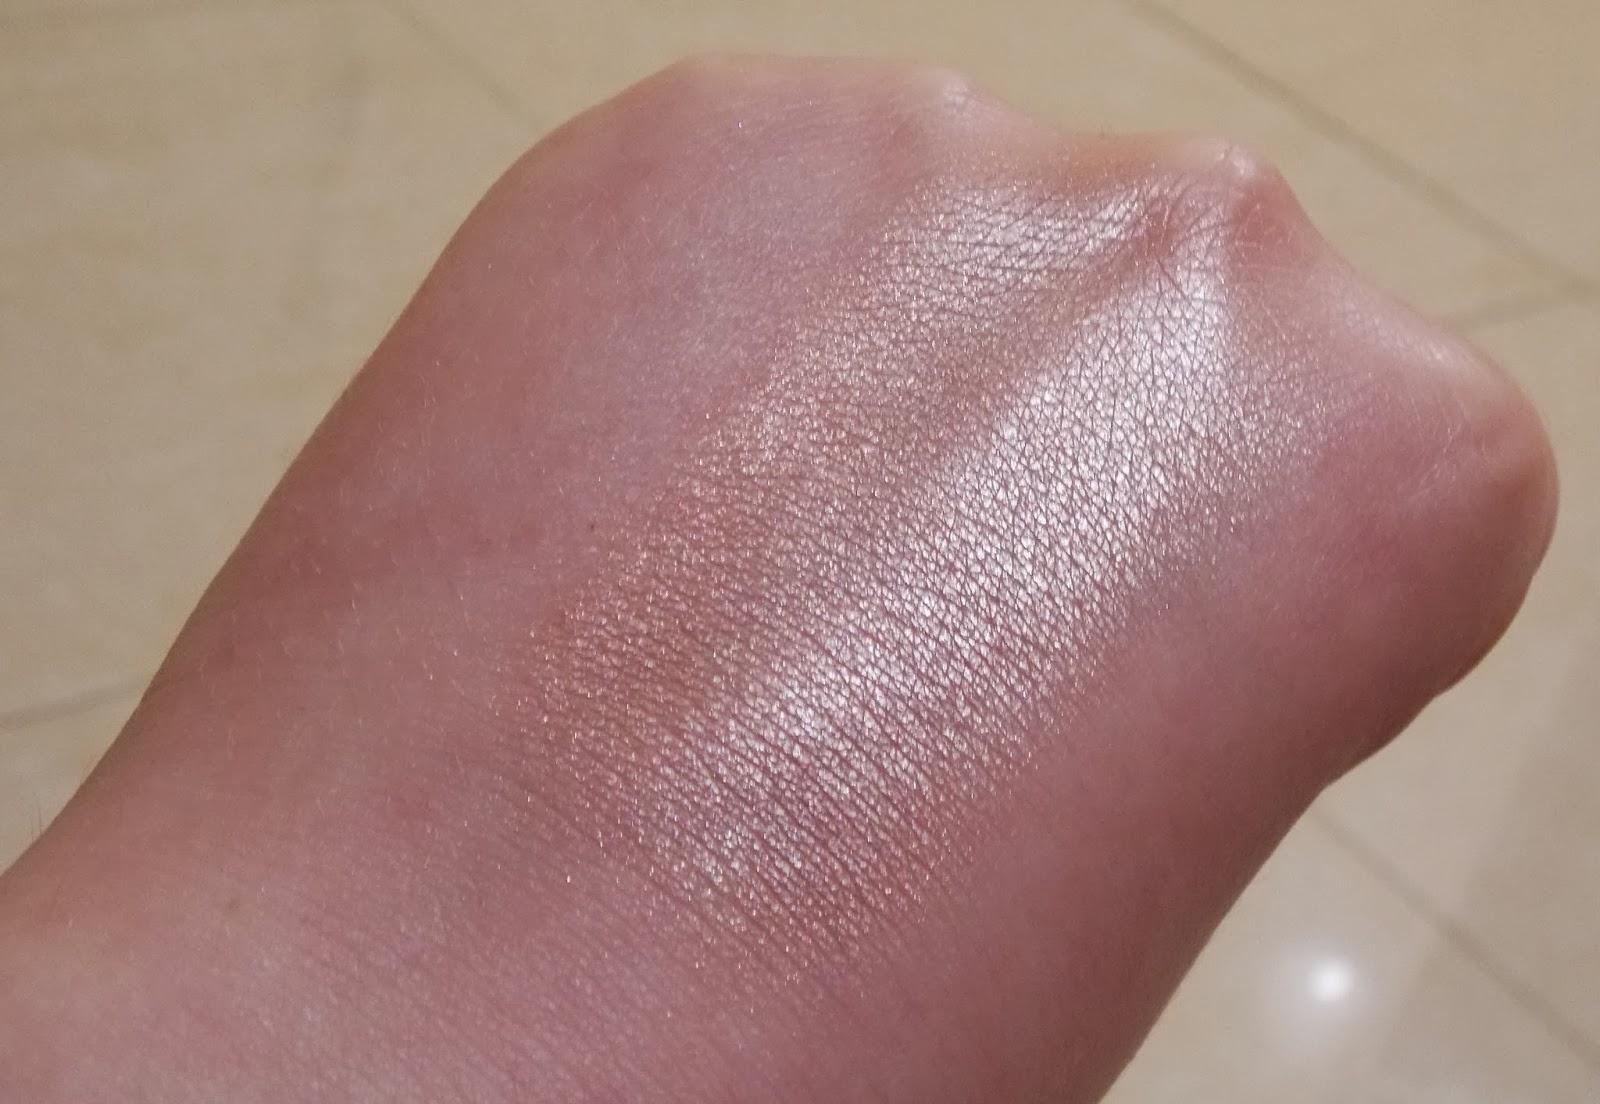 Mac Mineralise Skin Finish Soft and Gentle, MAC, Mac Cosmetics, How to give your skin a healthy glow, healthy glow, Glowing skin